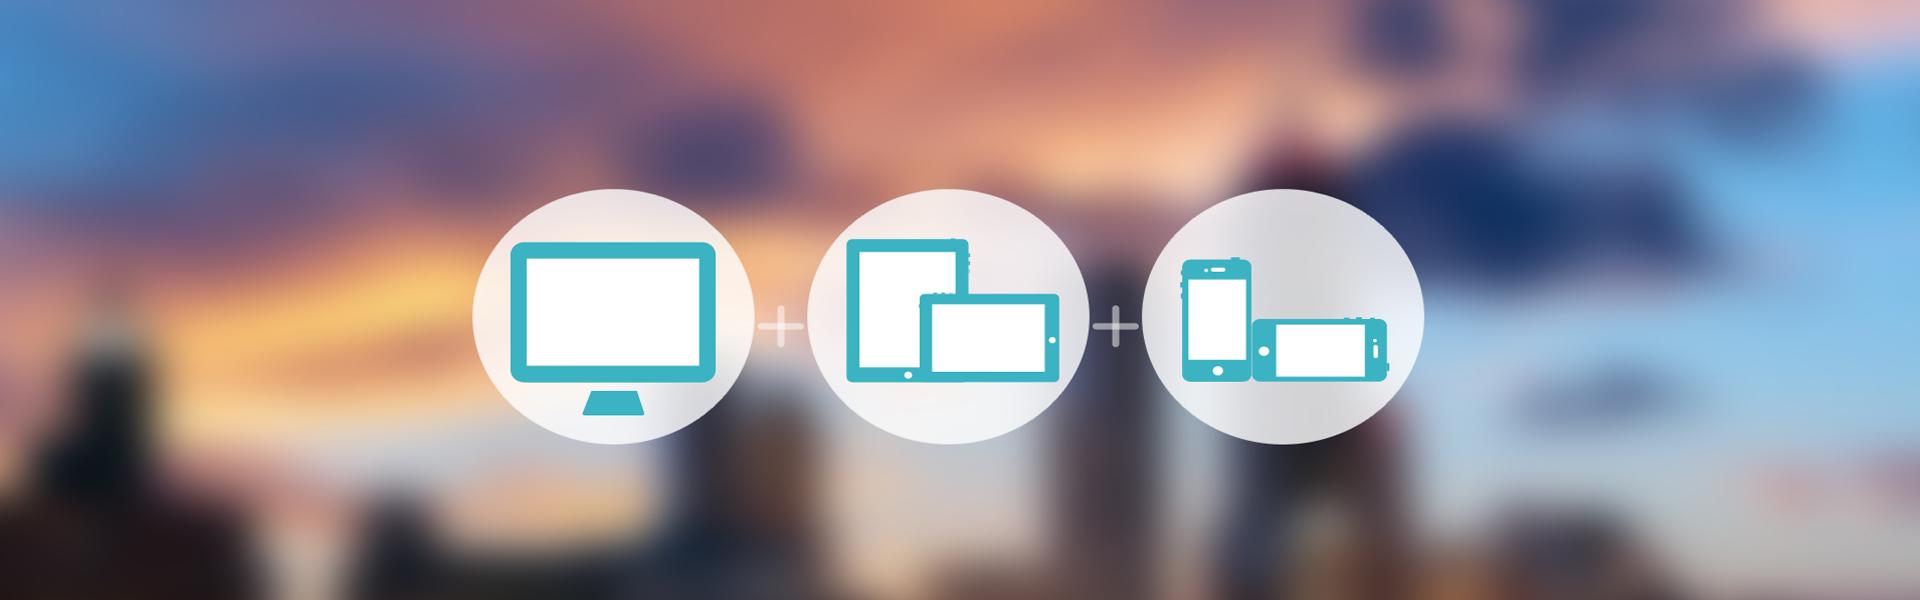 bs-art_responsive-webdesign